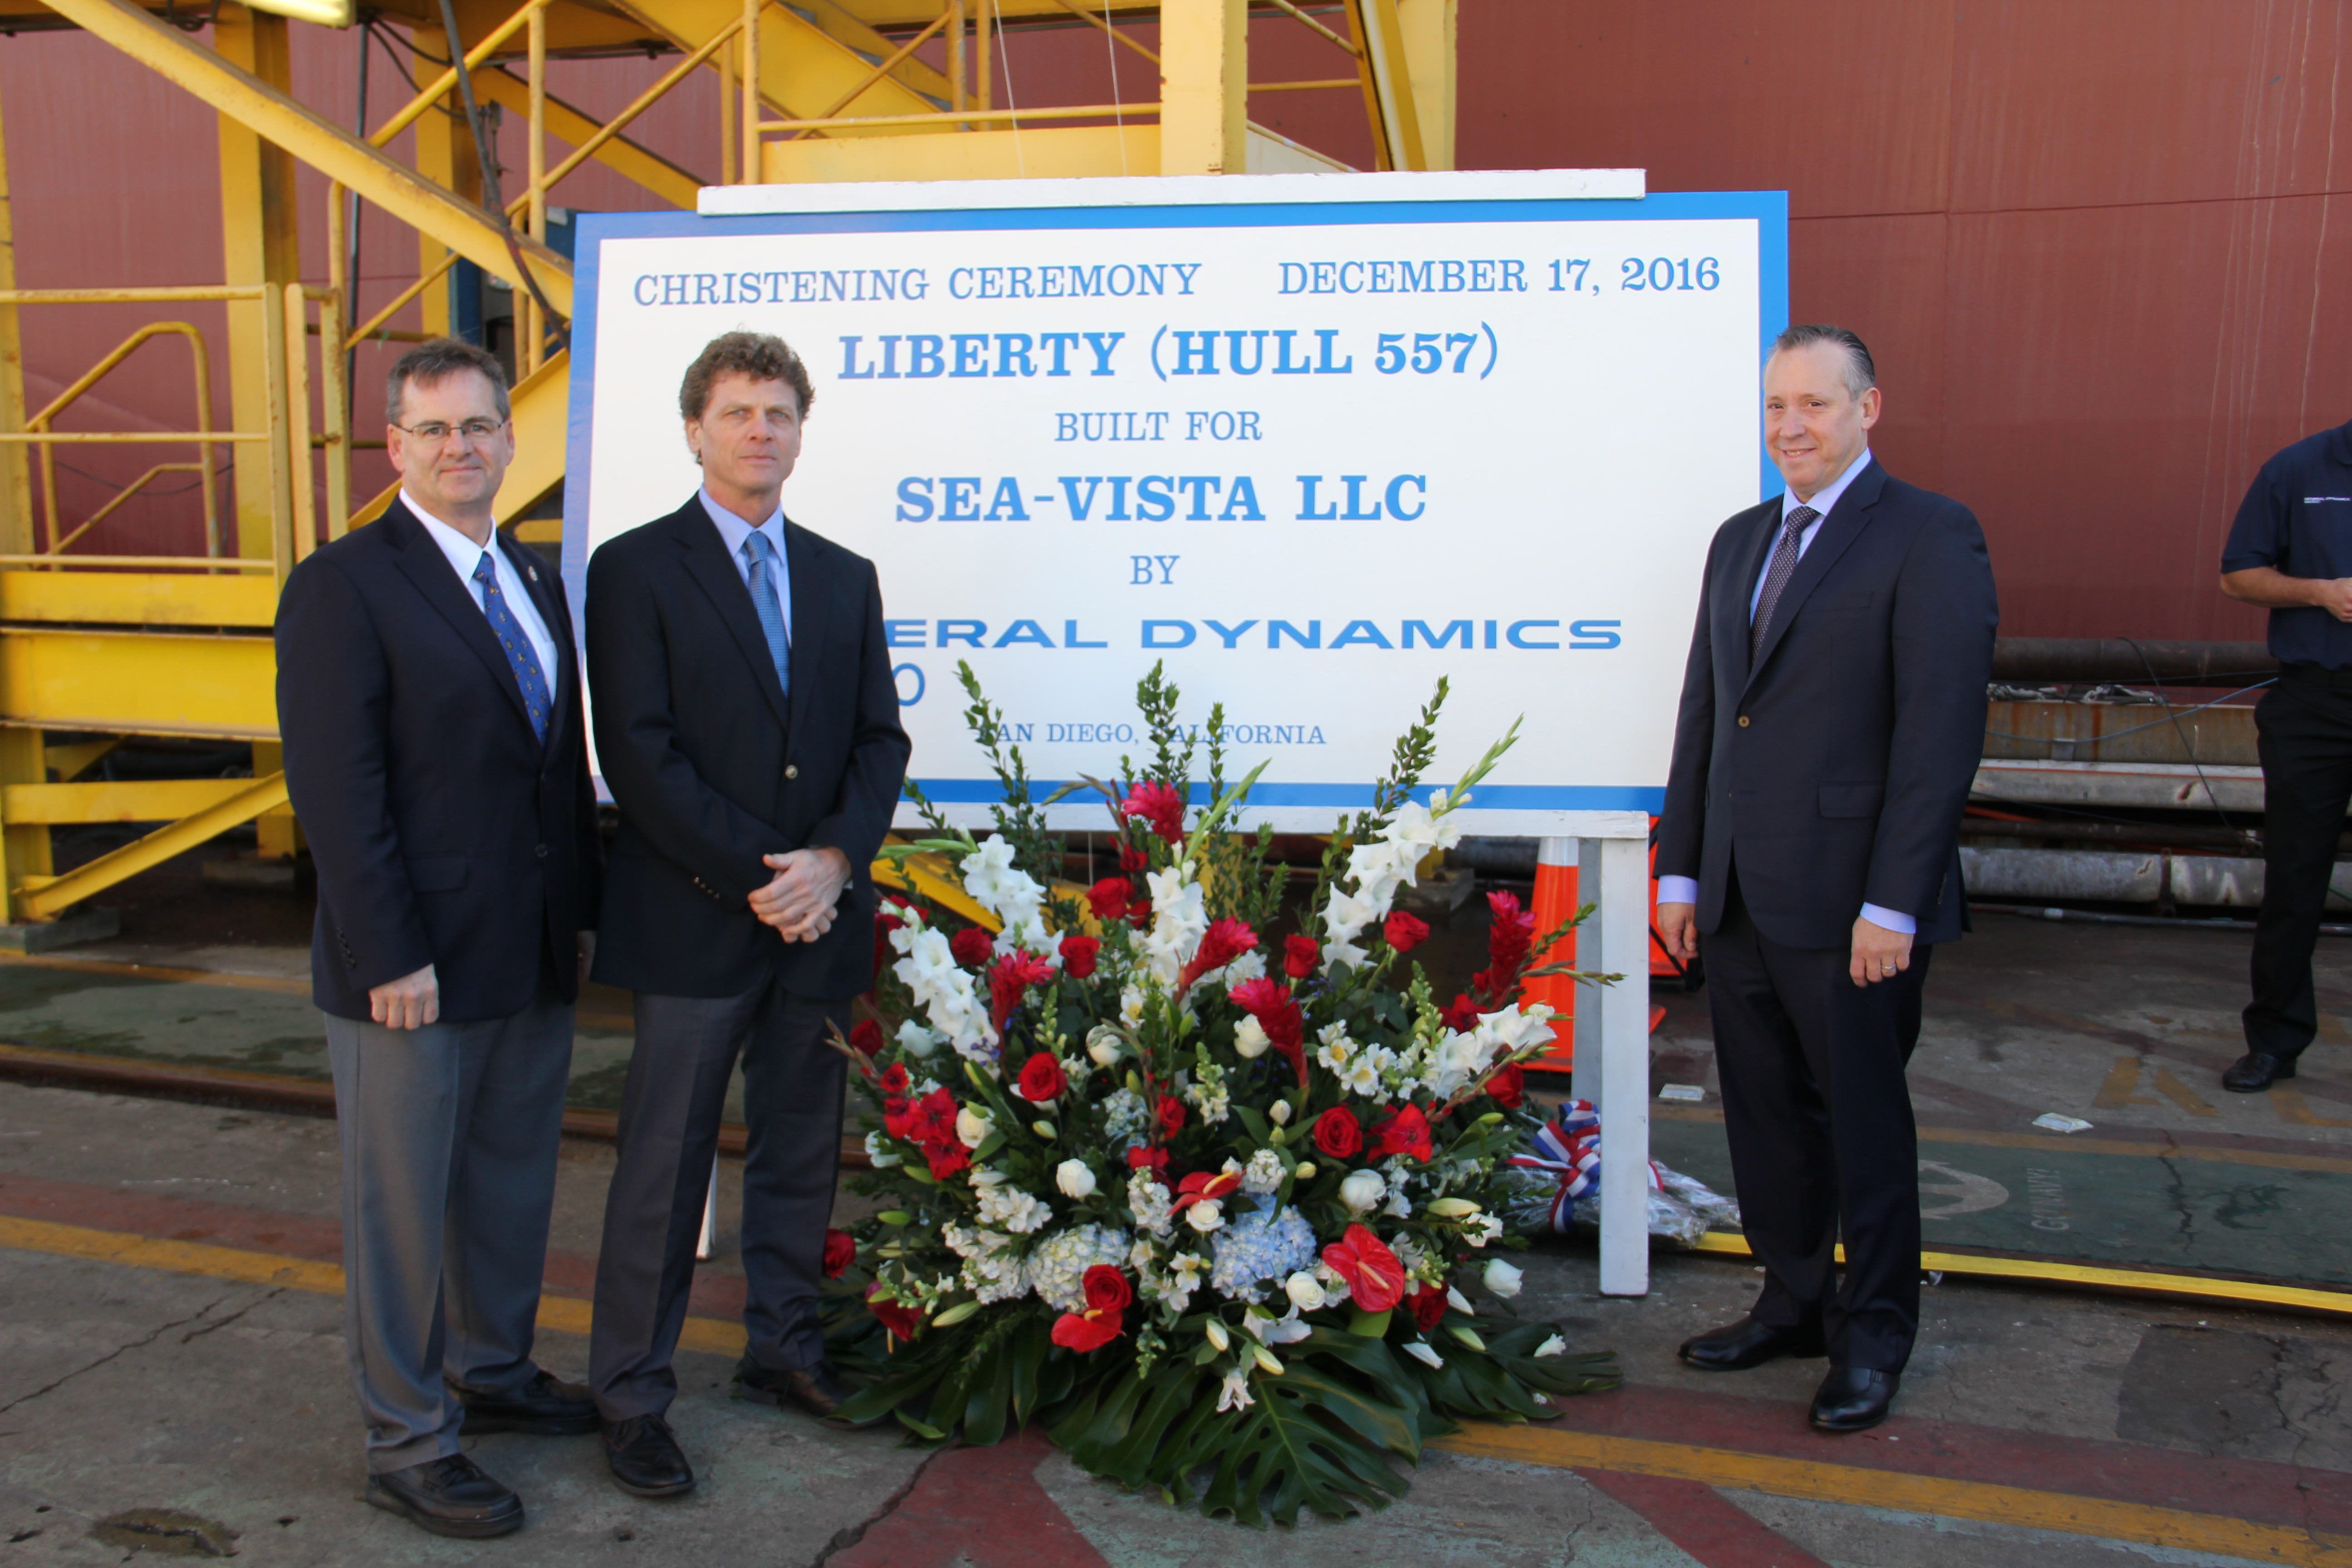 12-17-16 Liberty Hull 557 Christening (98)